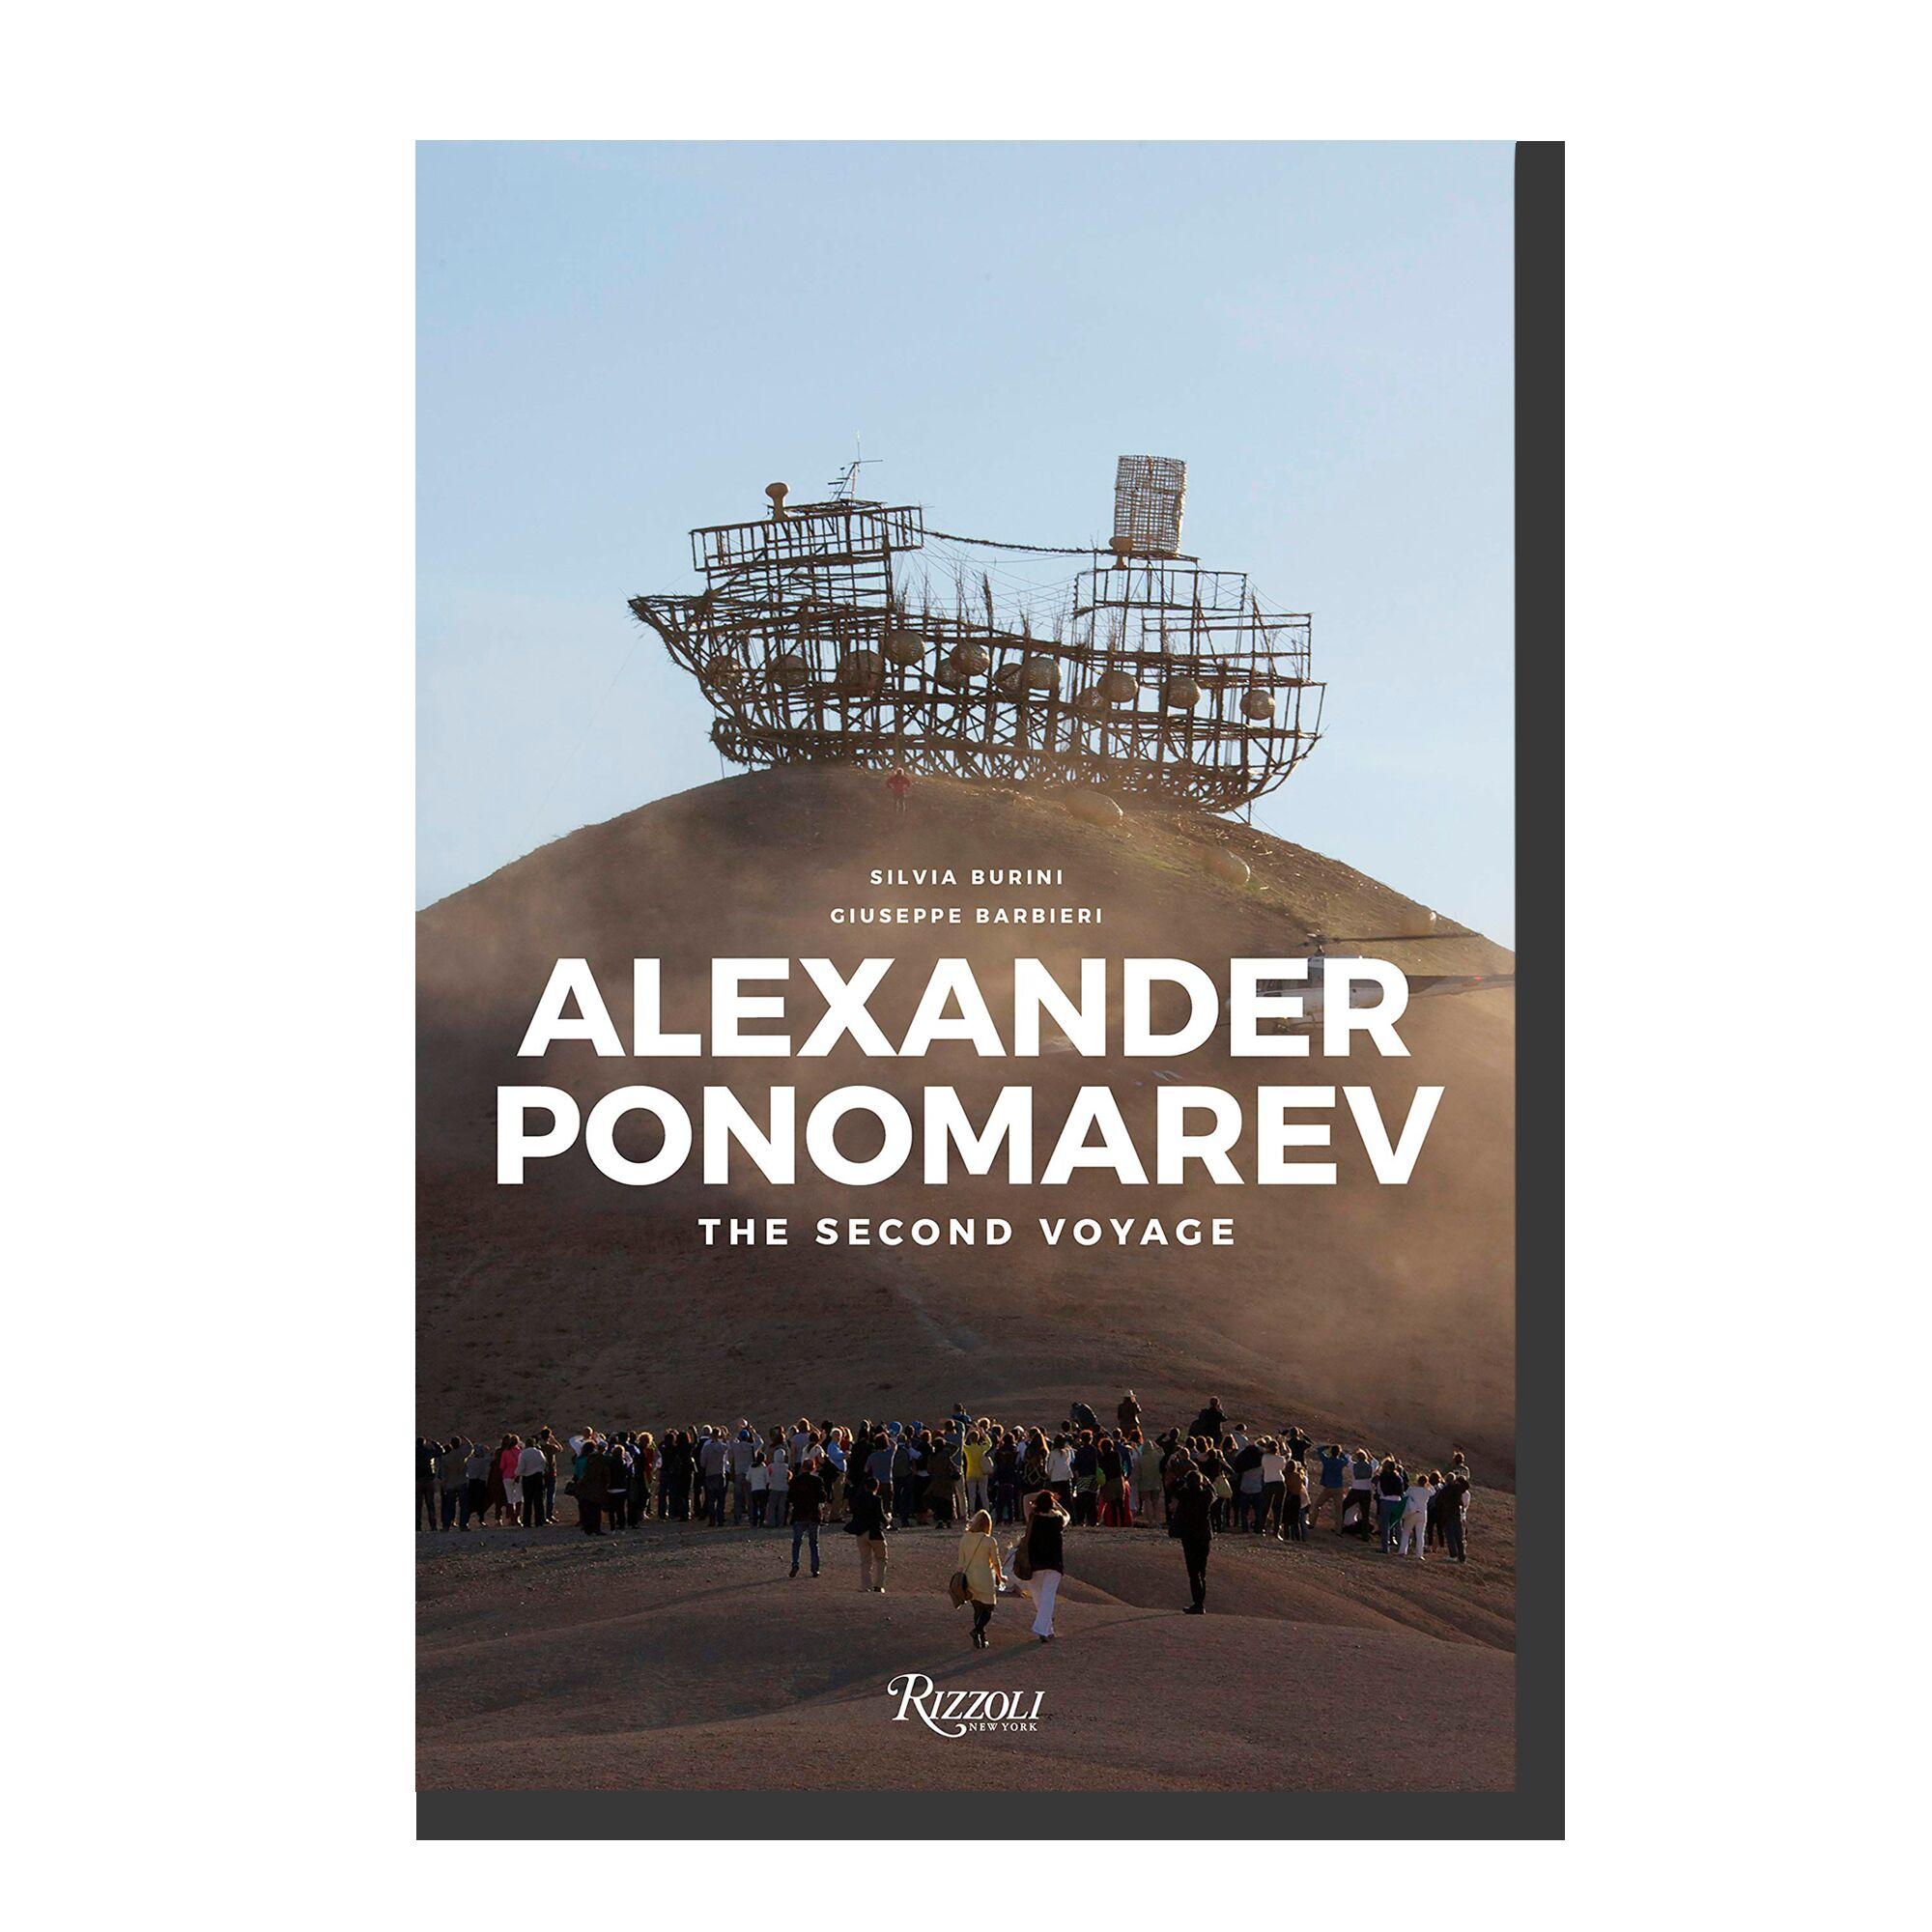 Aleksander Ponomarev: The Second Voyage